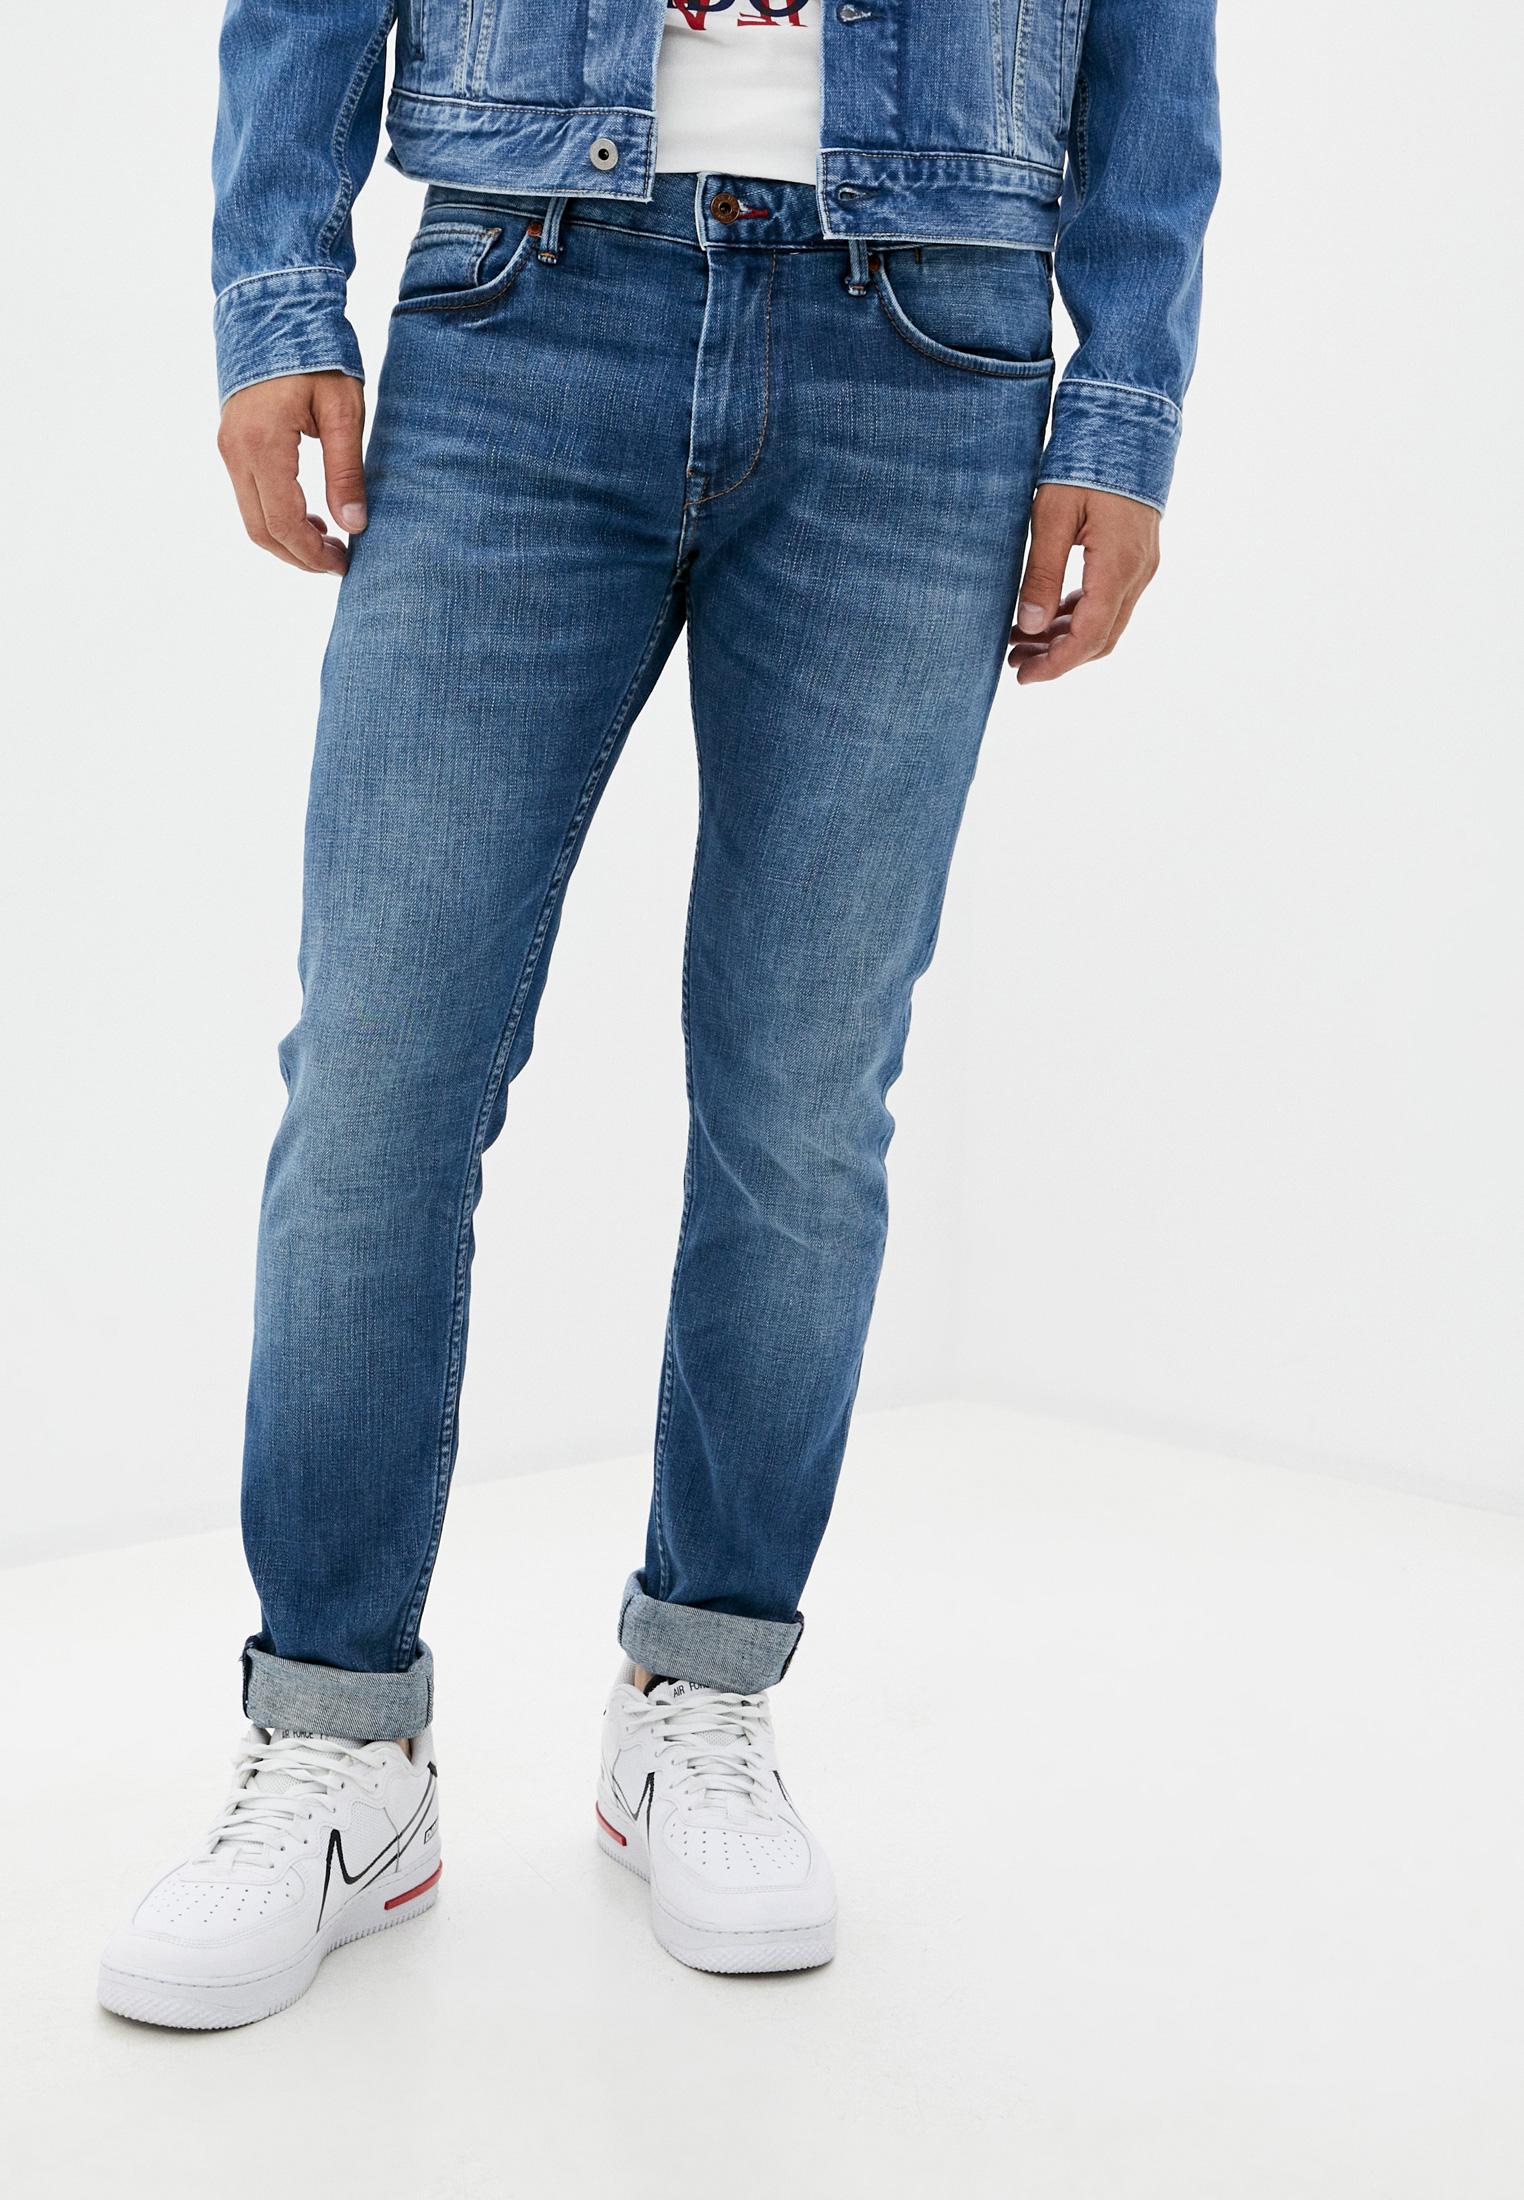 Зауженные джинсы Pepe Jeans (Пепе Джинс) PM205478HD8